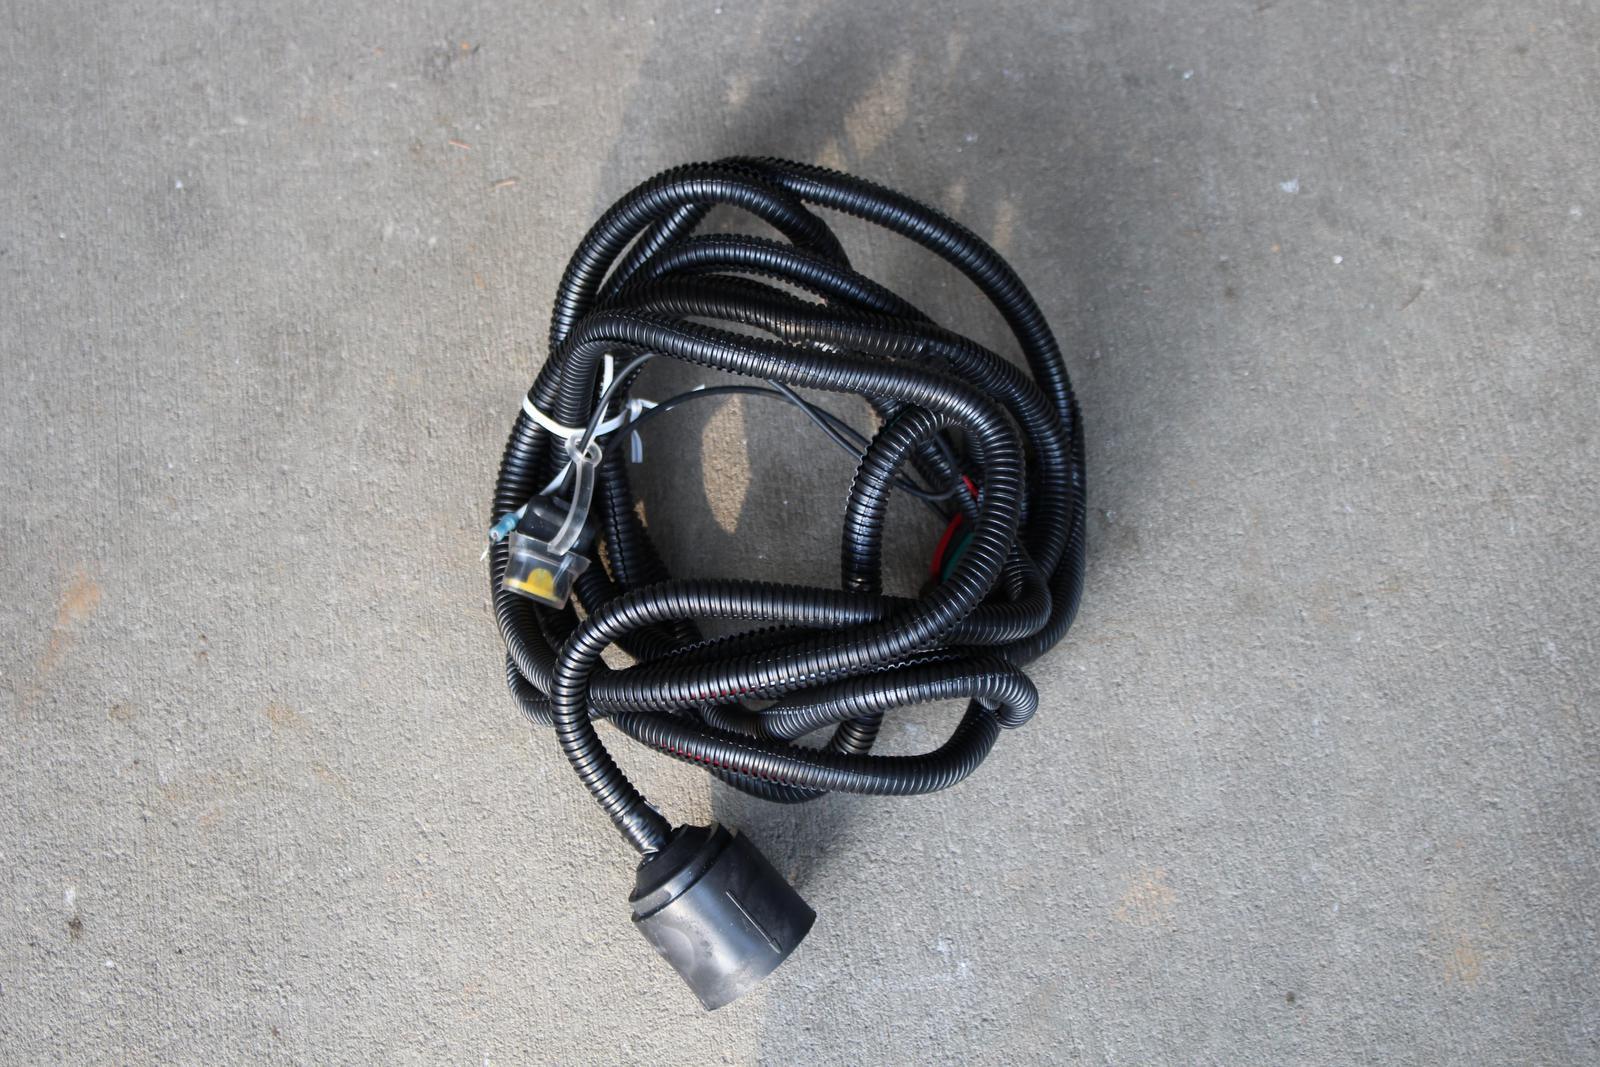 15680 meyer oem slik stik wiring harness meyer products  [ 1600 x 1067 Pixel ]